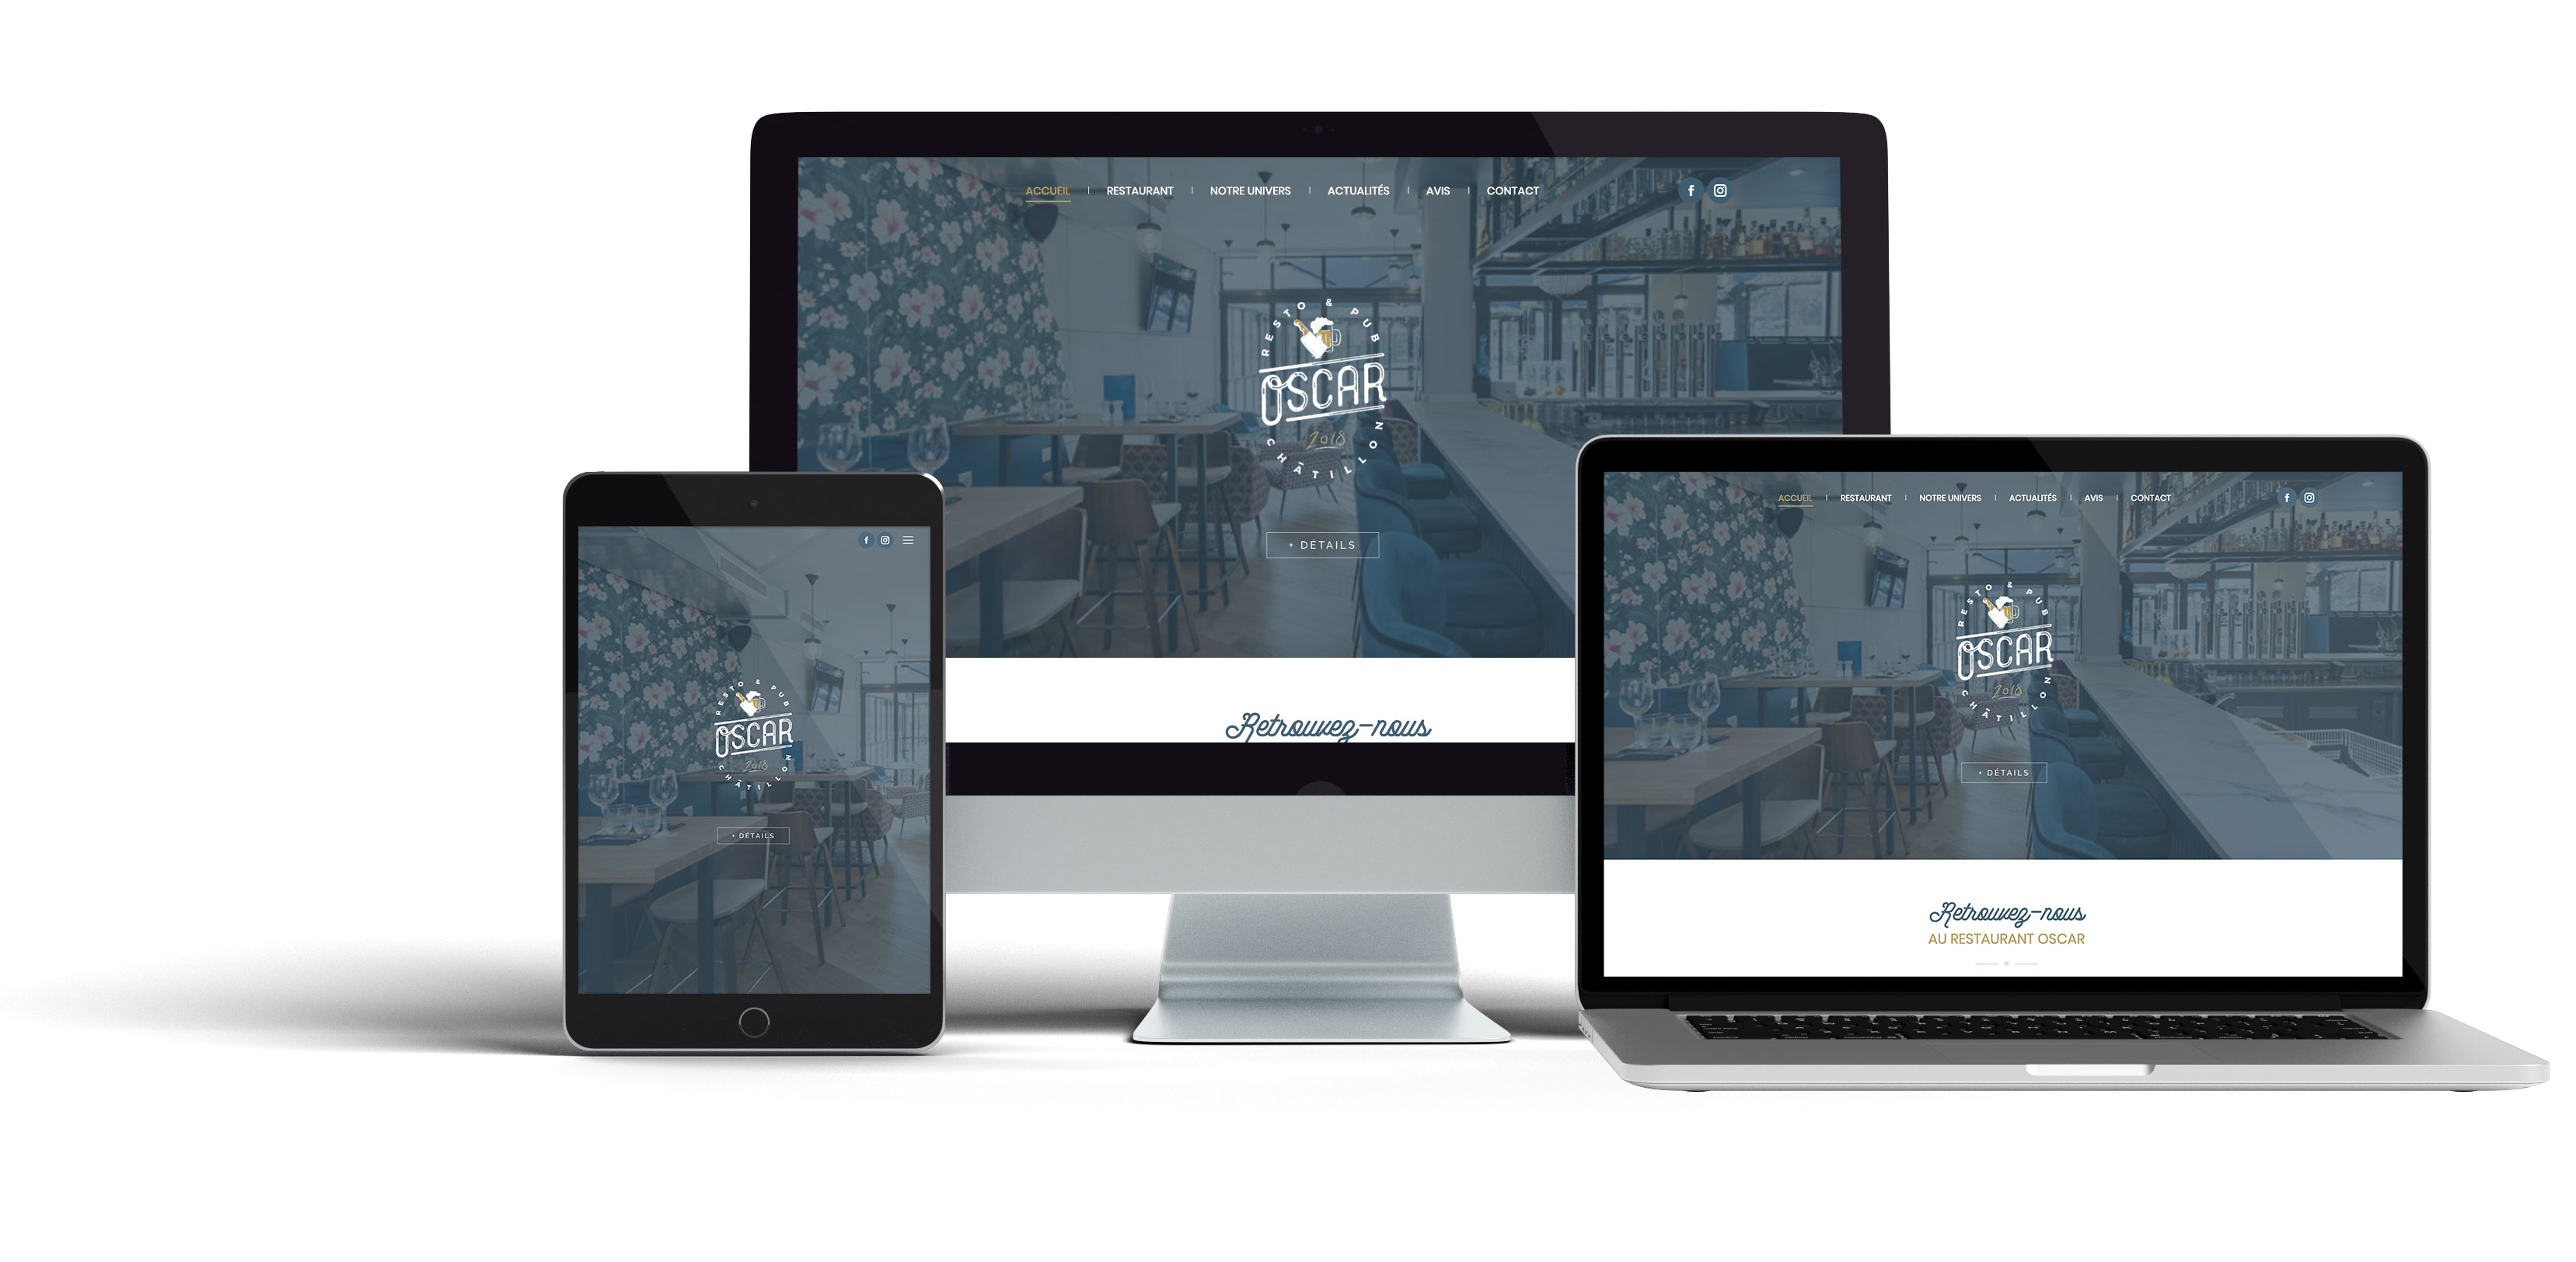 Oscar Responsive site web